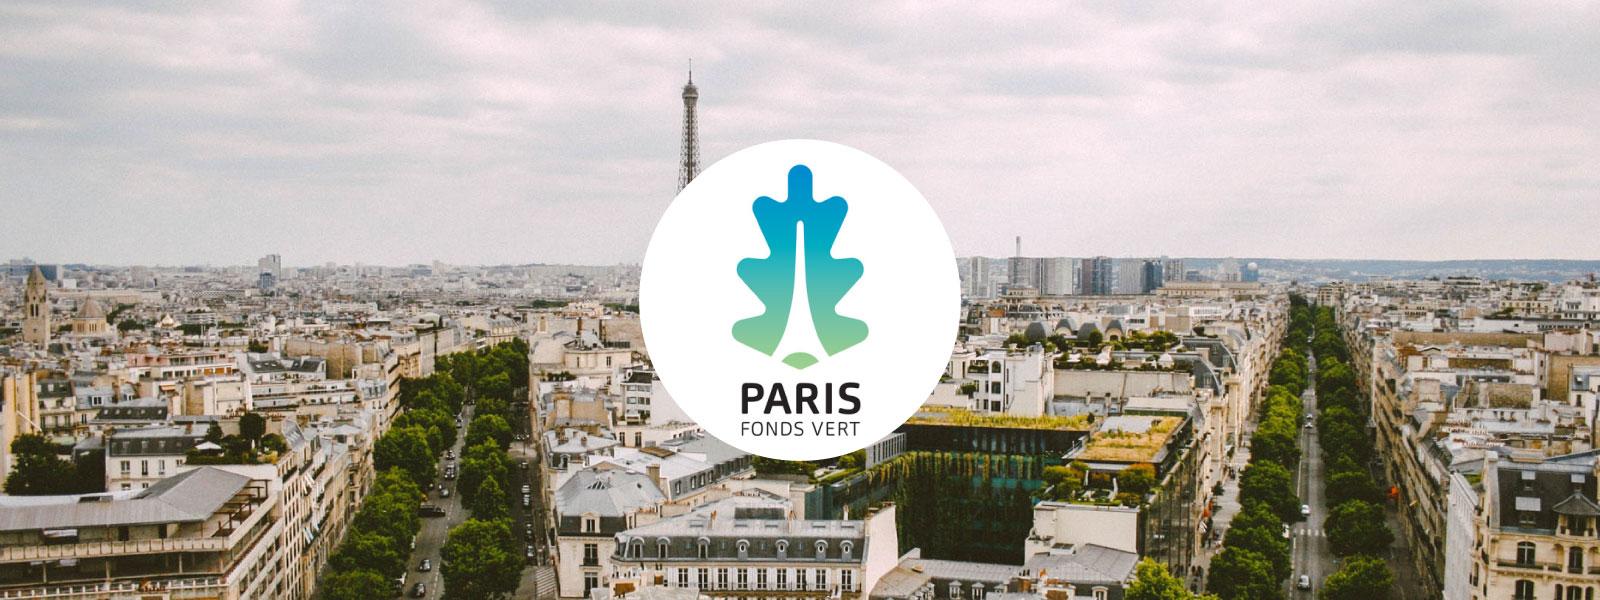 PARIS FONDS VERT : UN DISPOSITIF DE FINANCEMENT INNOVANT